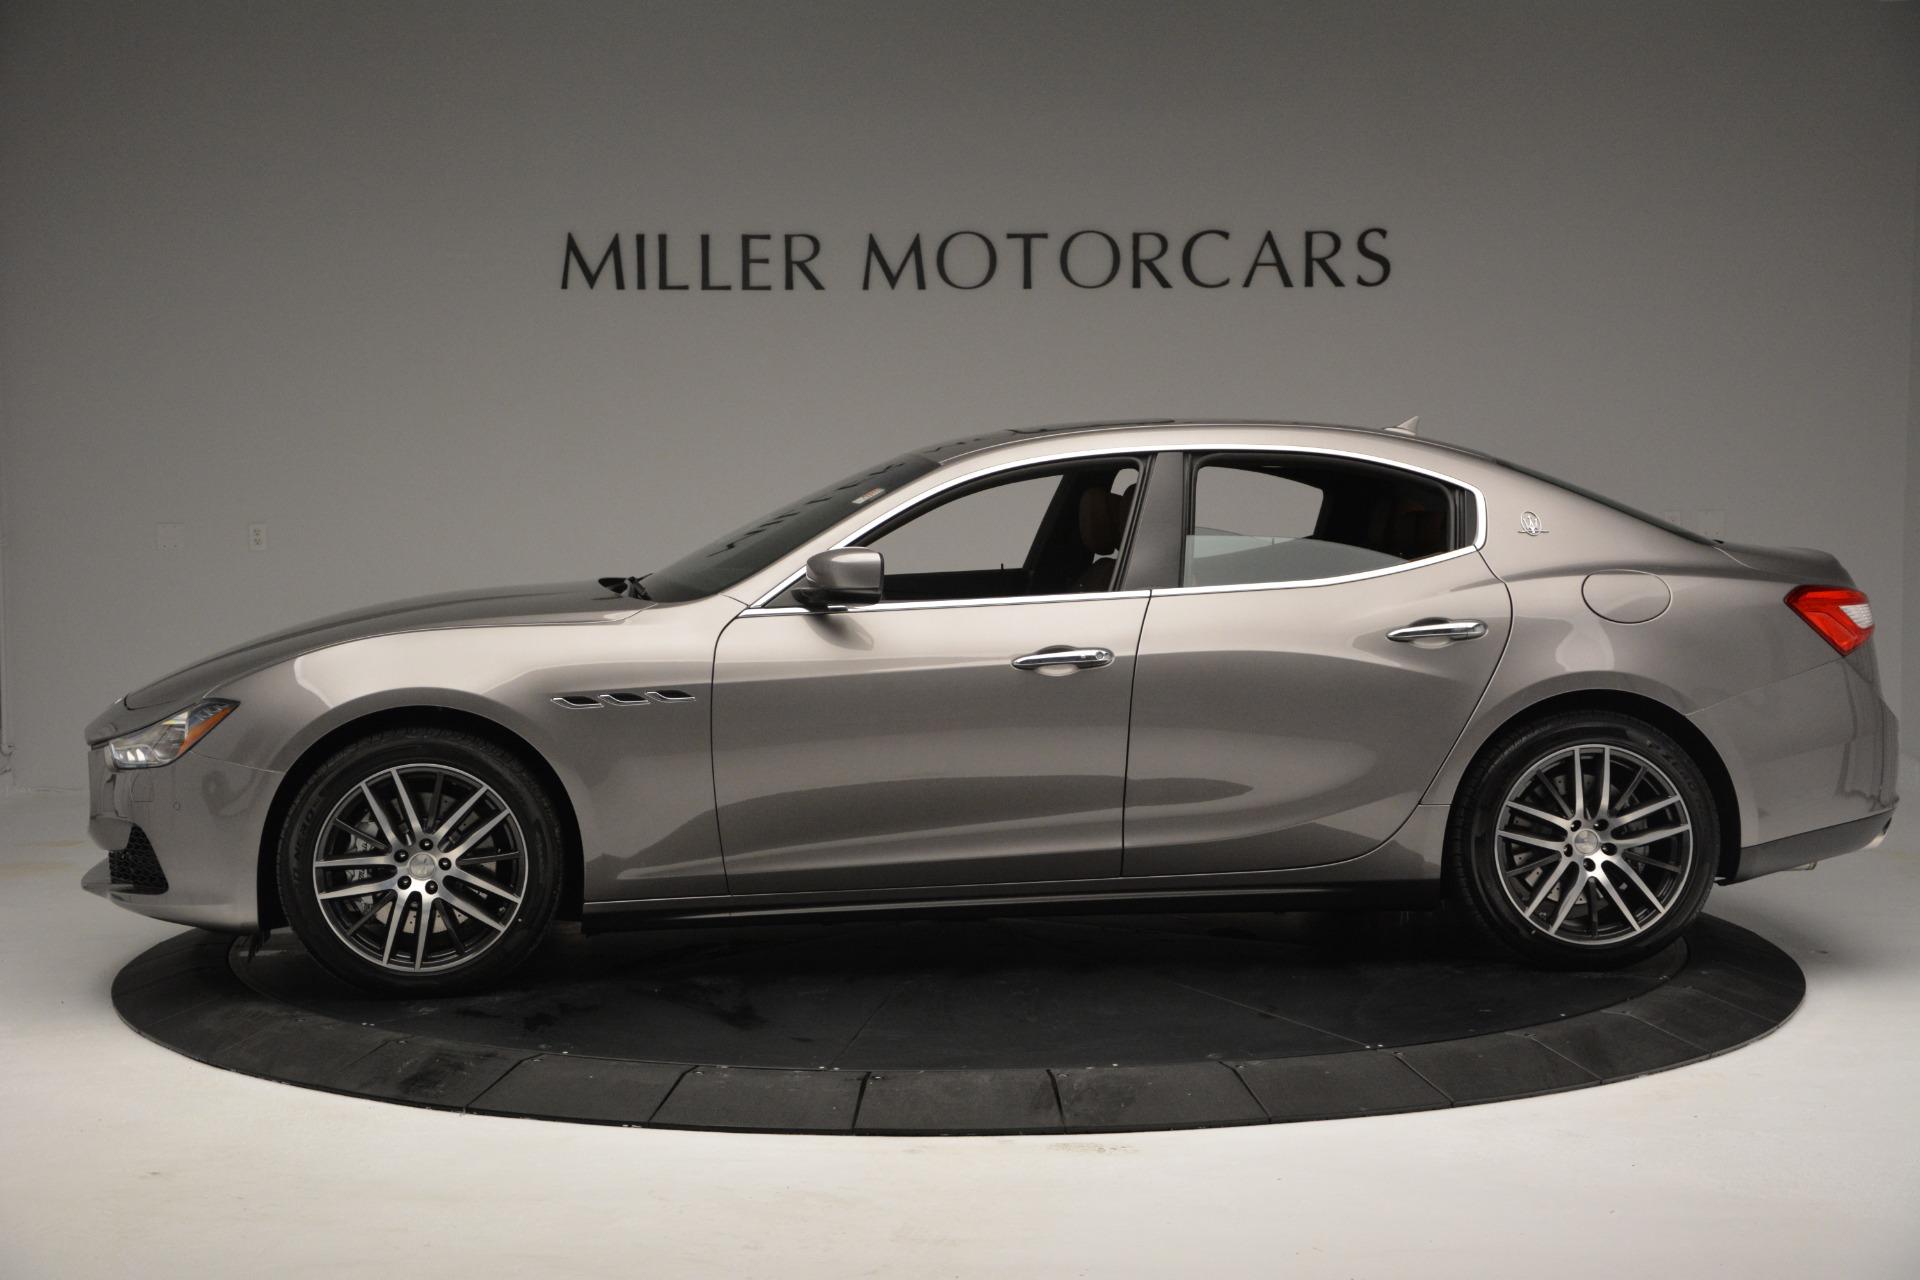 Used 2017 Maserati Ghibli S Q4 EX-LOANER For Sale In Greenwich, CT 608_p3